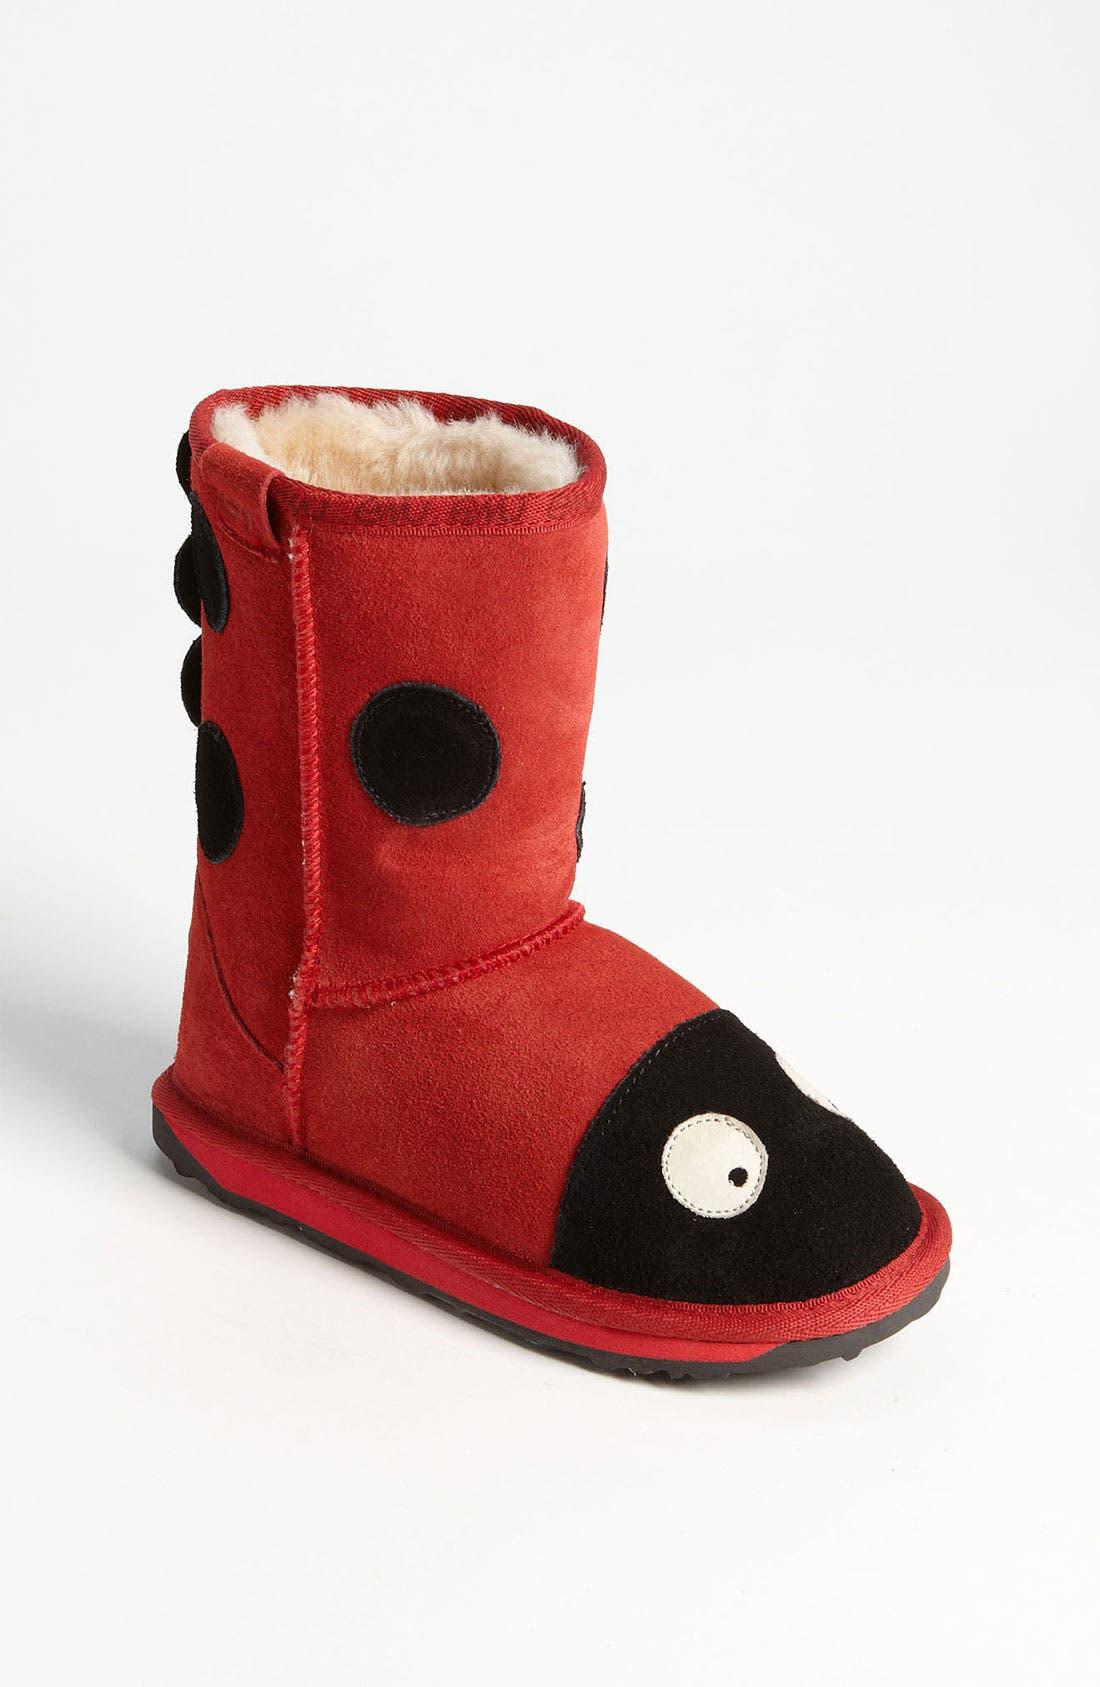 Alternate Image 1 Selected - EMU Australia 'Little Creatures - Ladybug' Boot (Toddler, Little Kid & Big Kid)